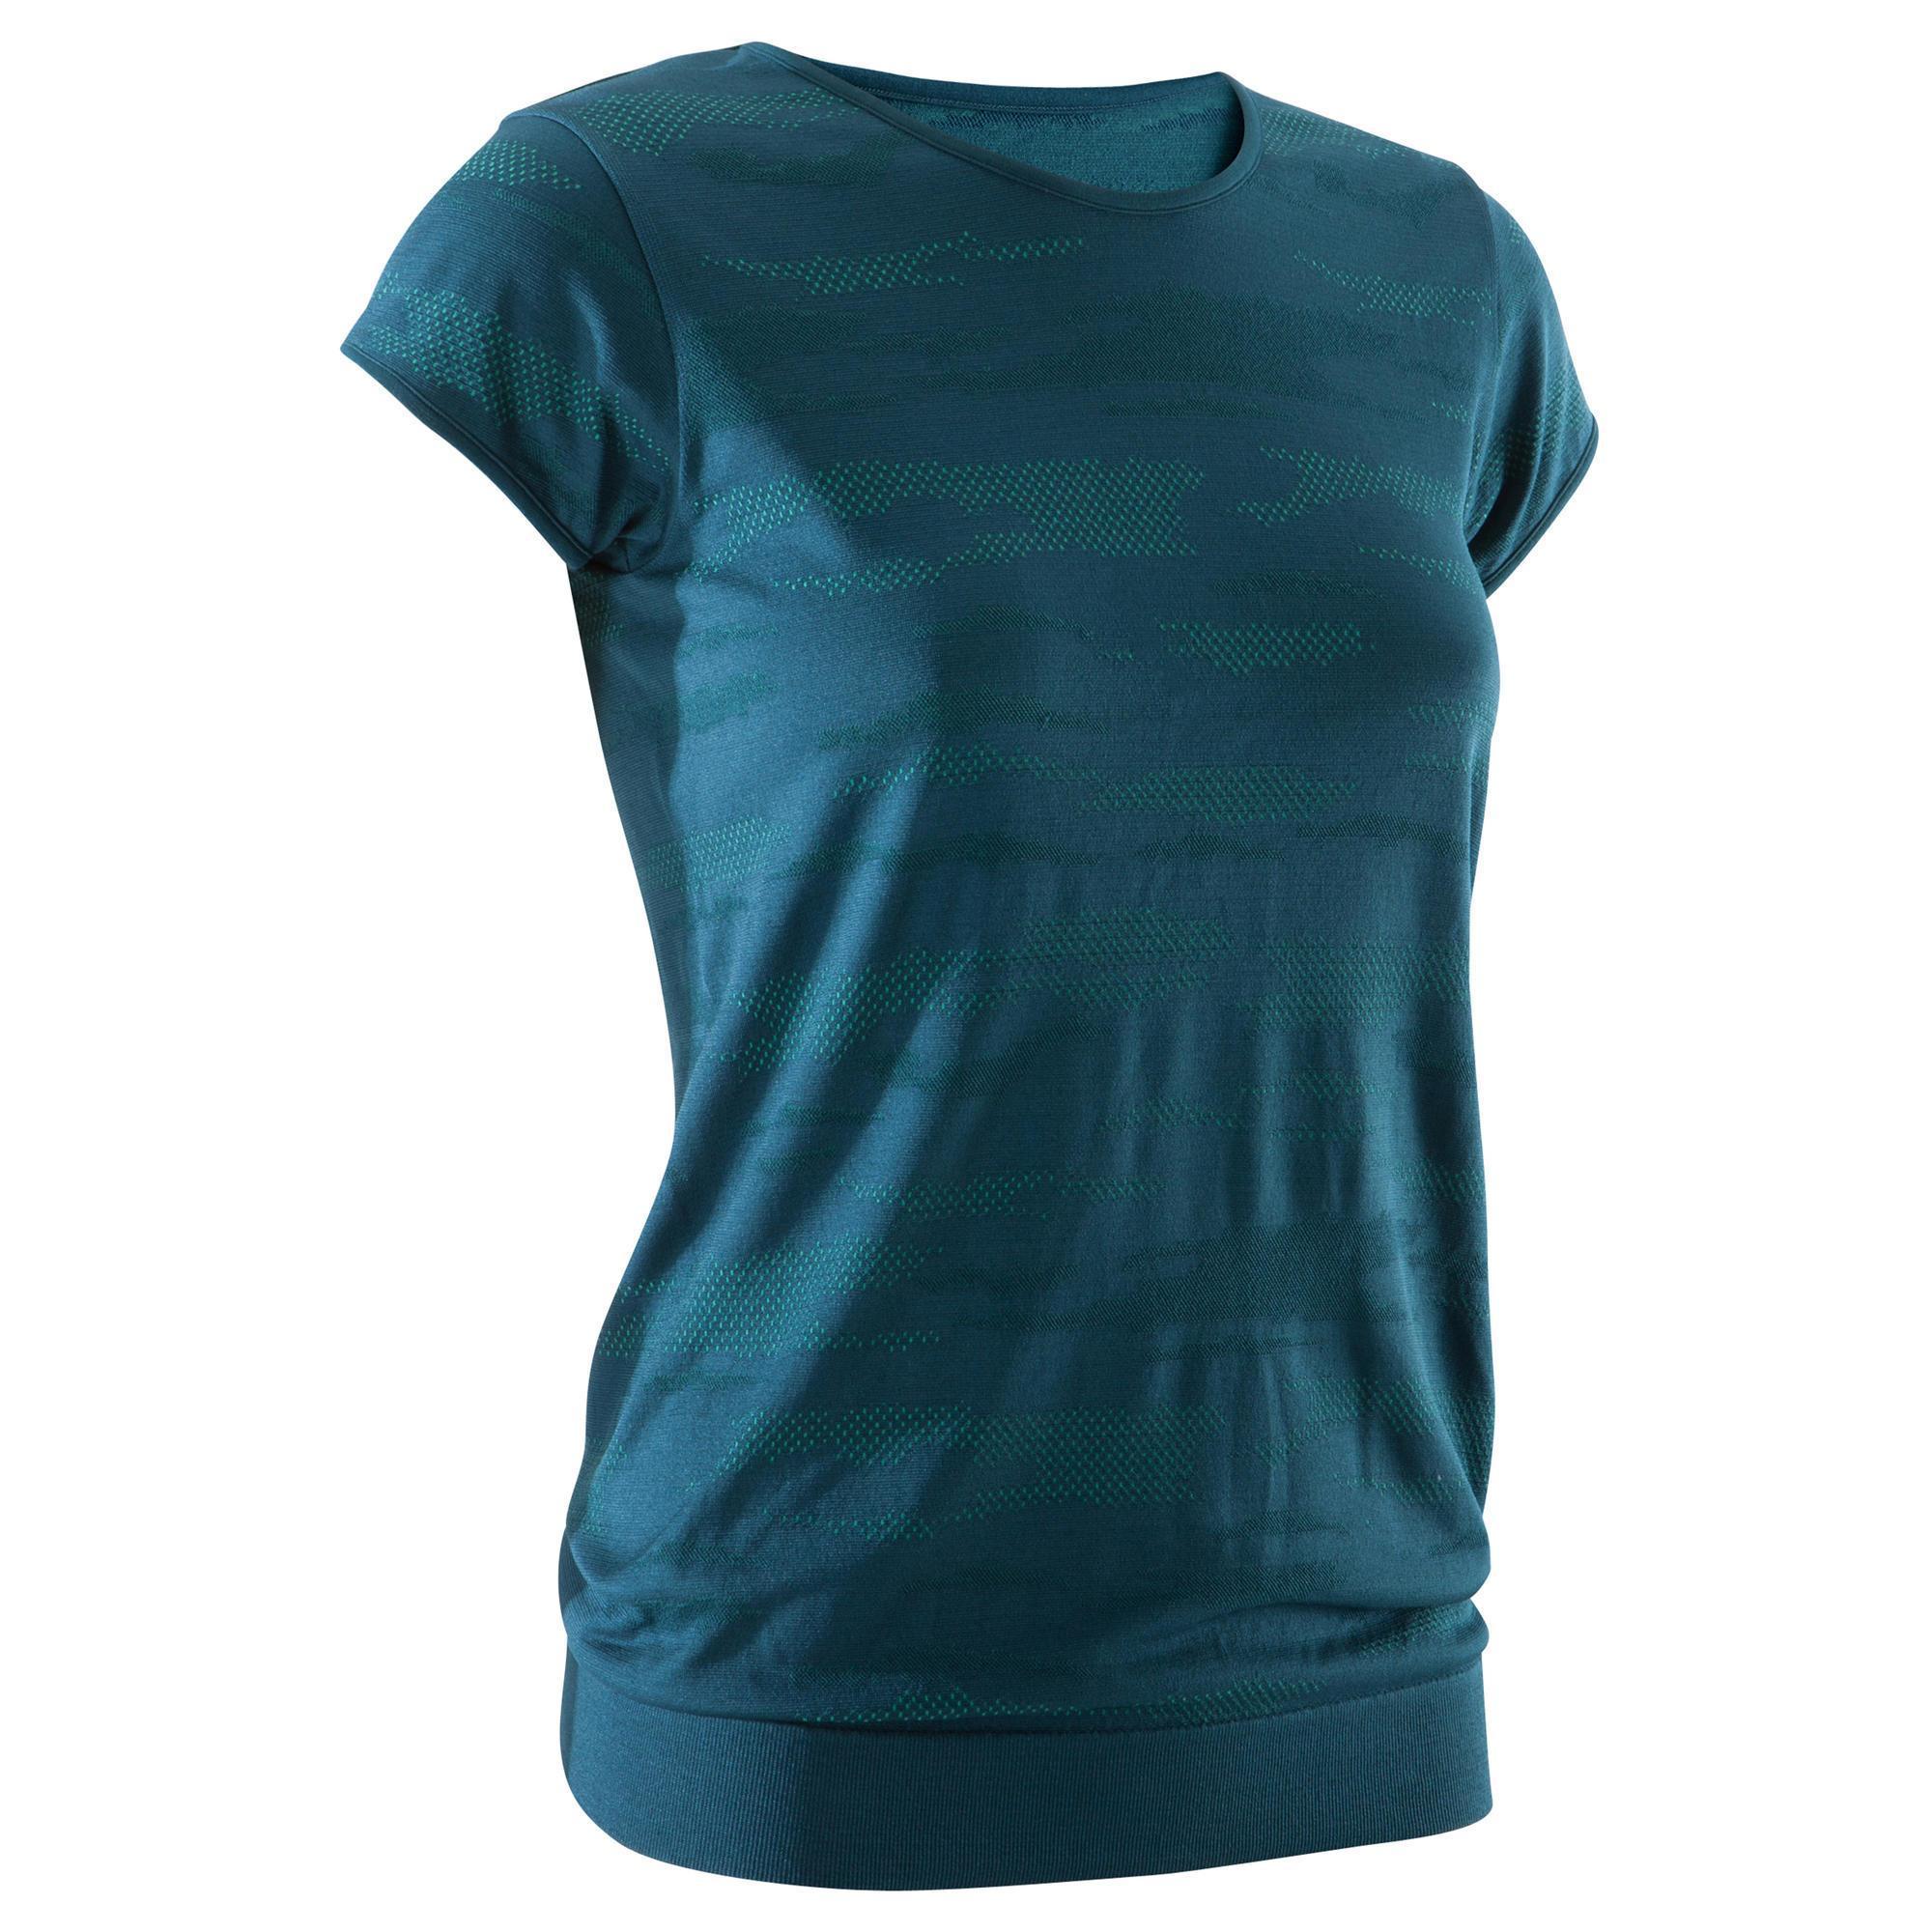 Women's Seamless Yoga T-Shirt - Green